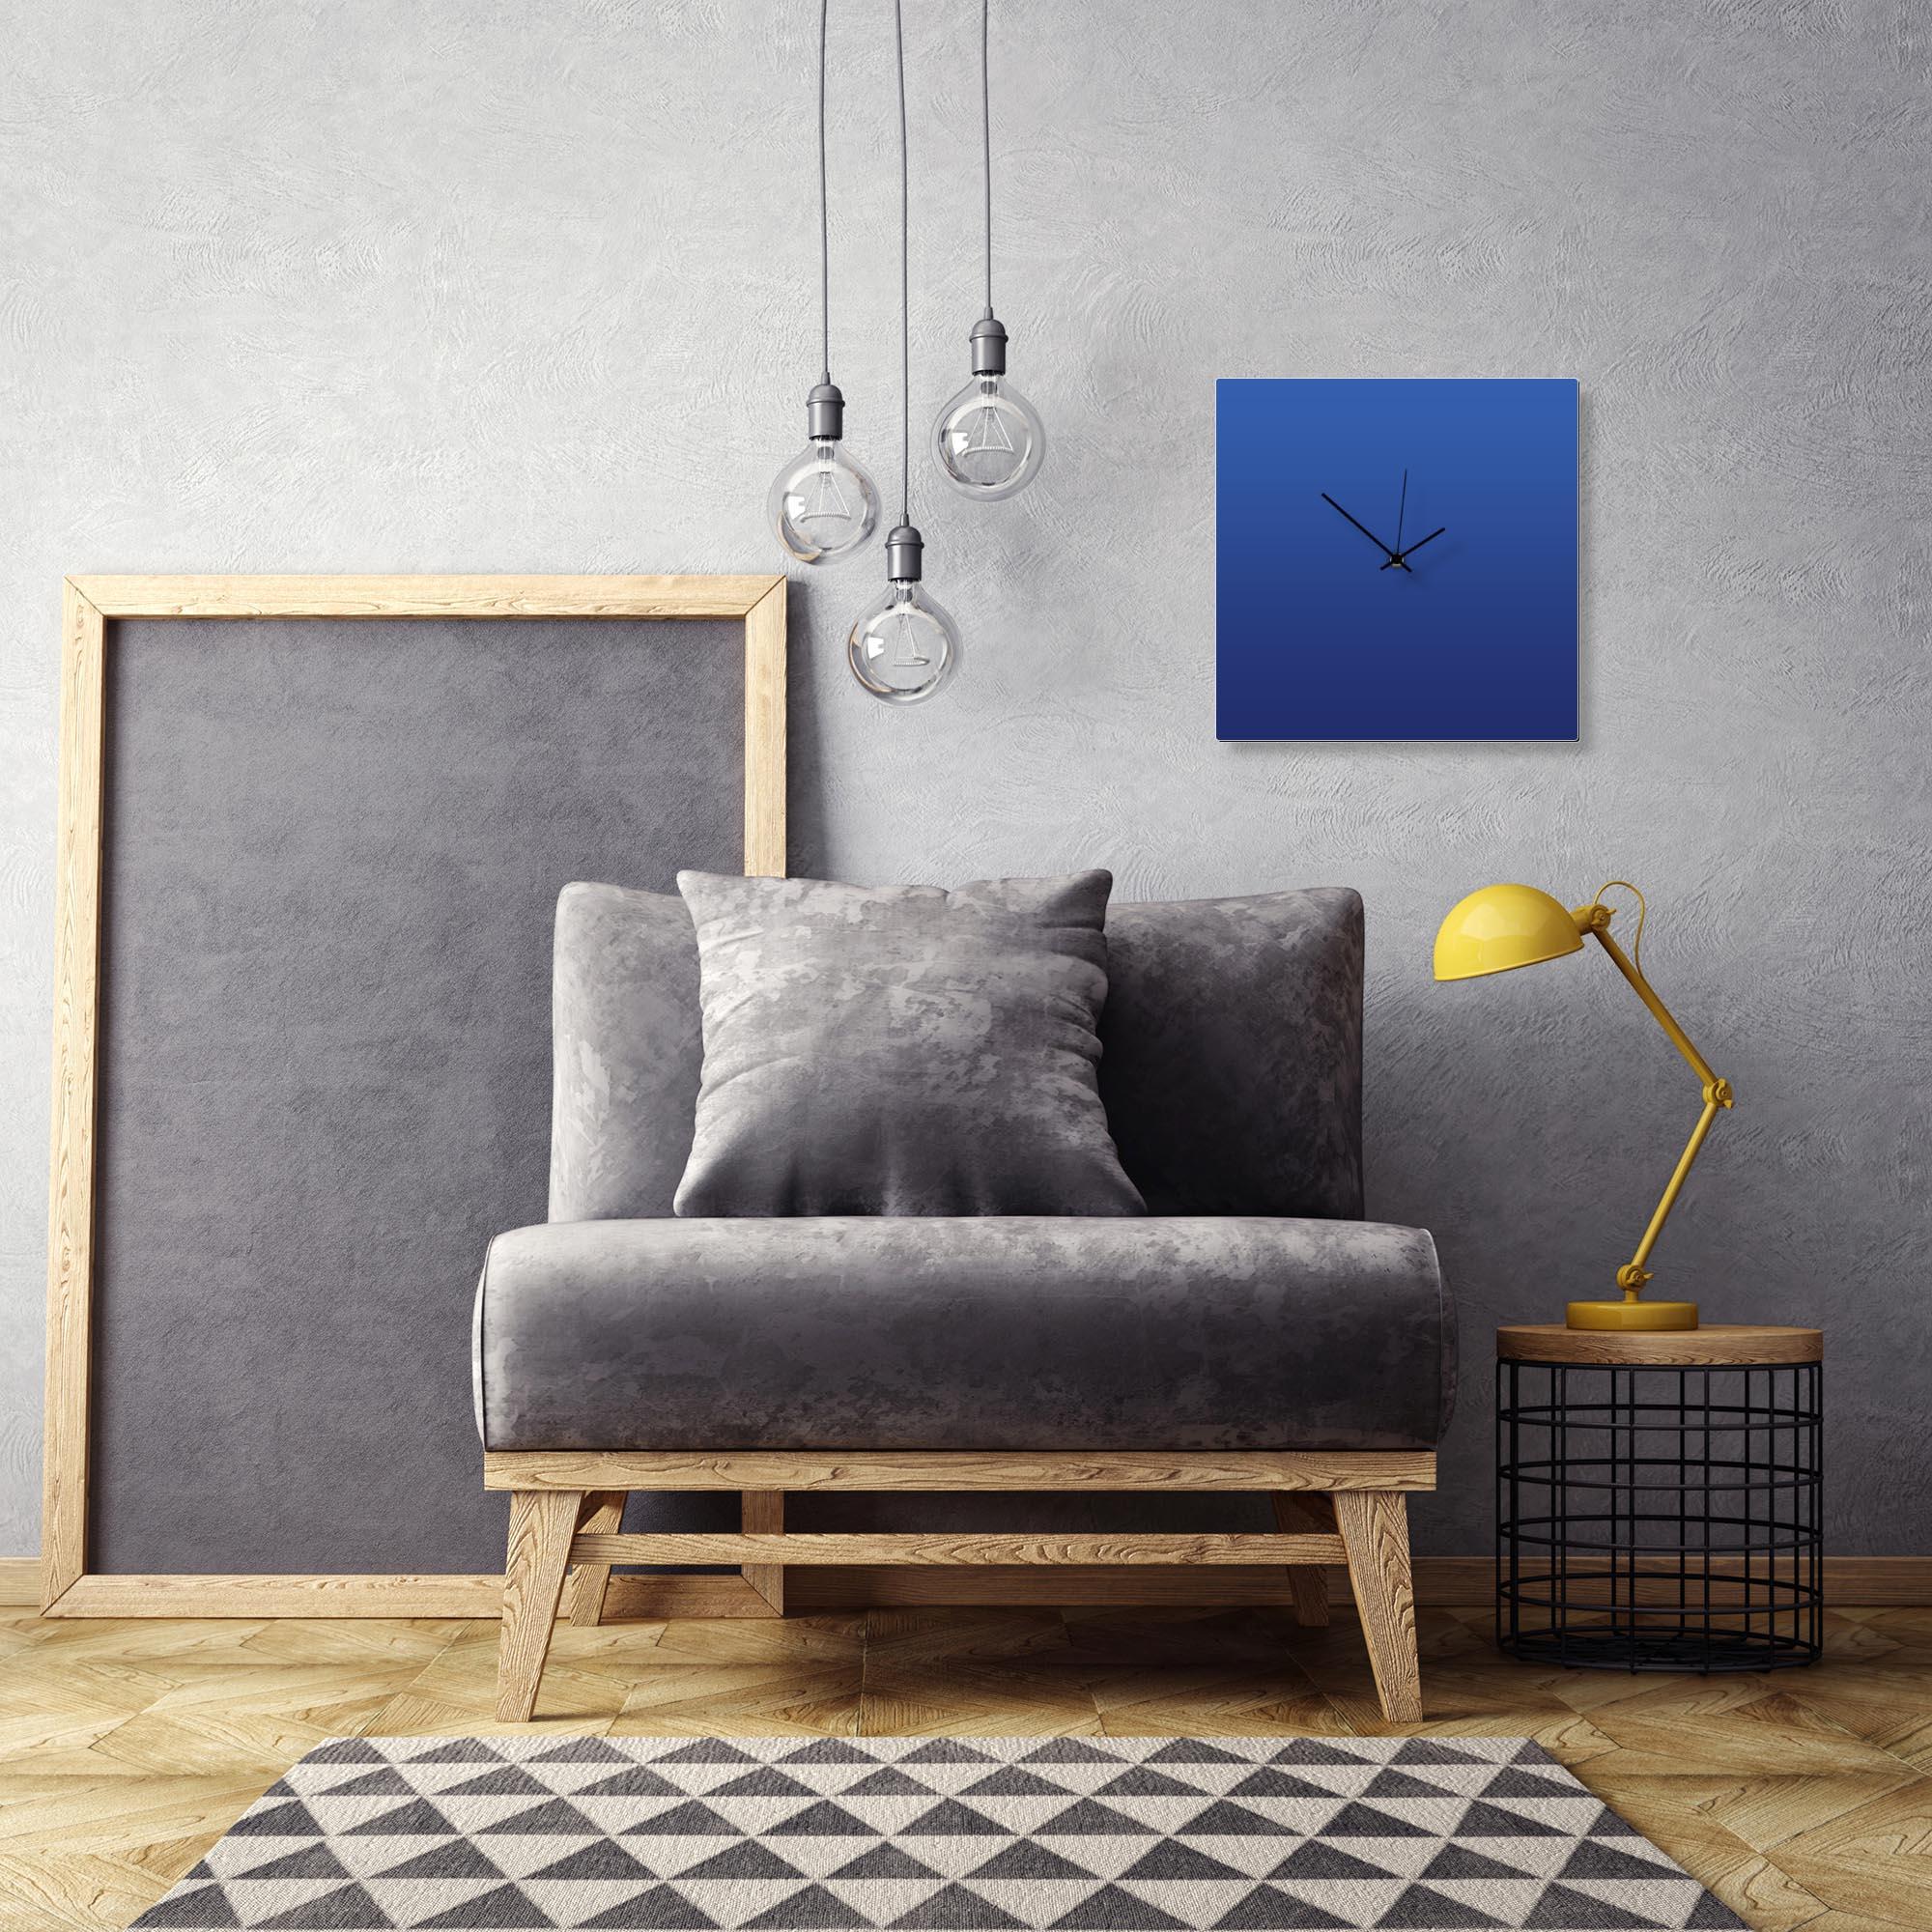 Blueout Black Square Clock by Adam Schwoeppe Contemporary Clock on Aluminum Polymetal - Alternate View 1